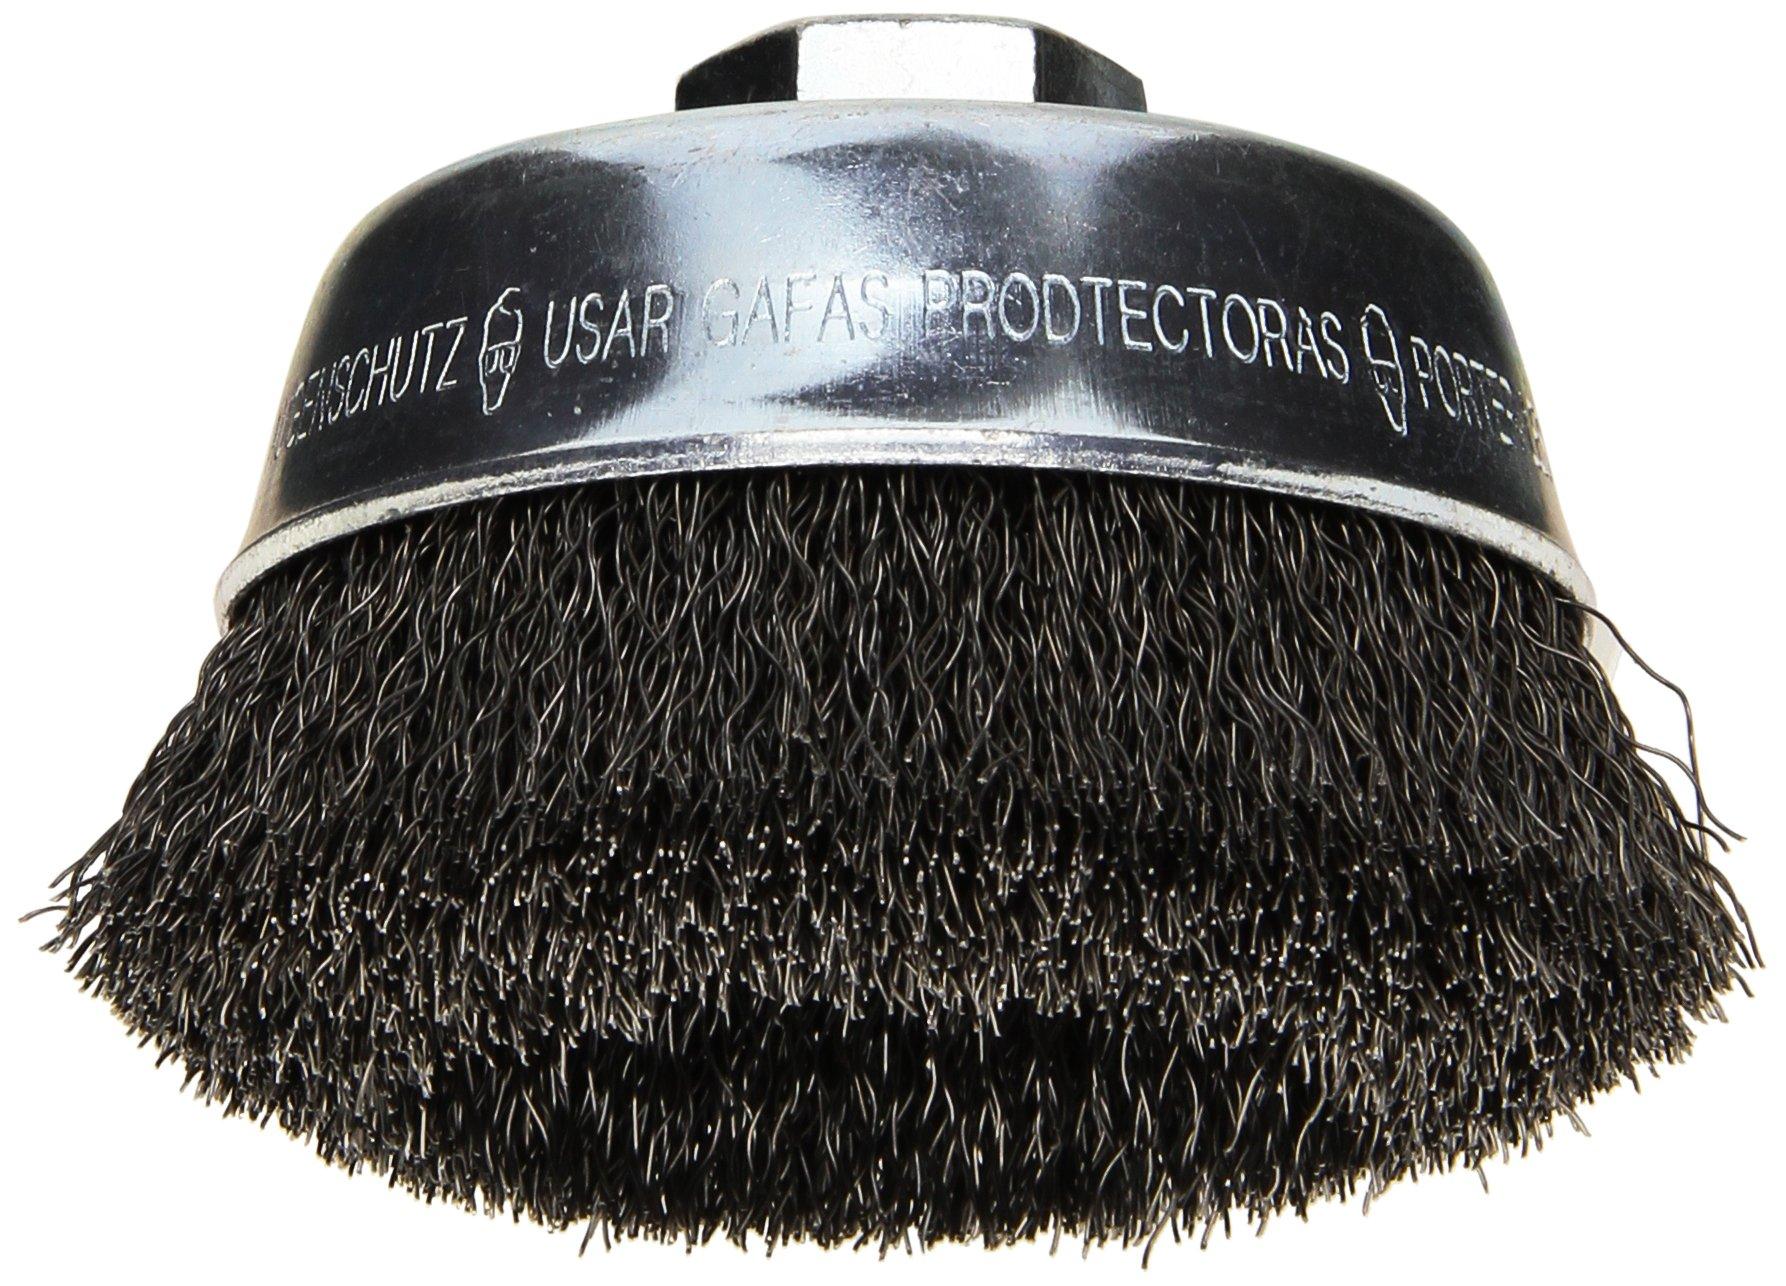 Bosch WB524 3 1/2-Inch Crimped Carbon Steel Cup Brush, 5/8-Inch x 11 Thread Arbor by Bosch